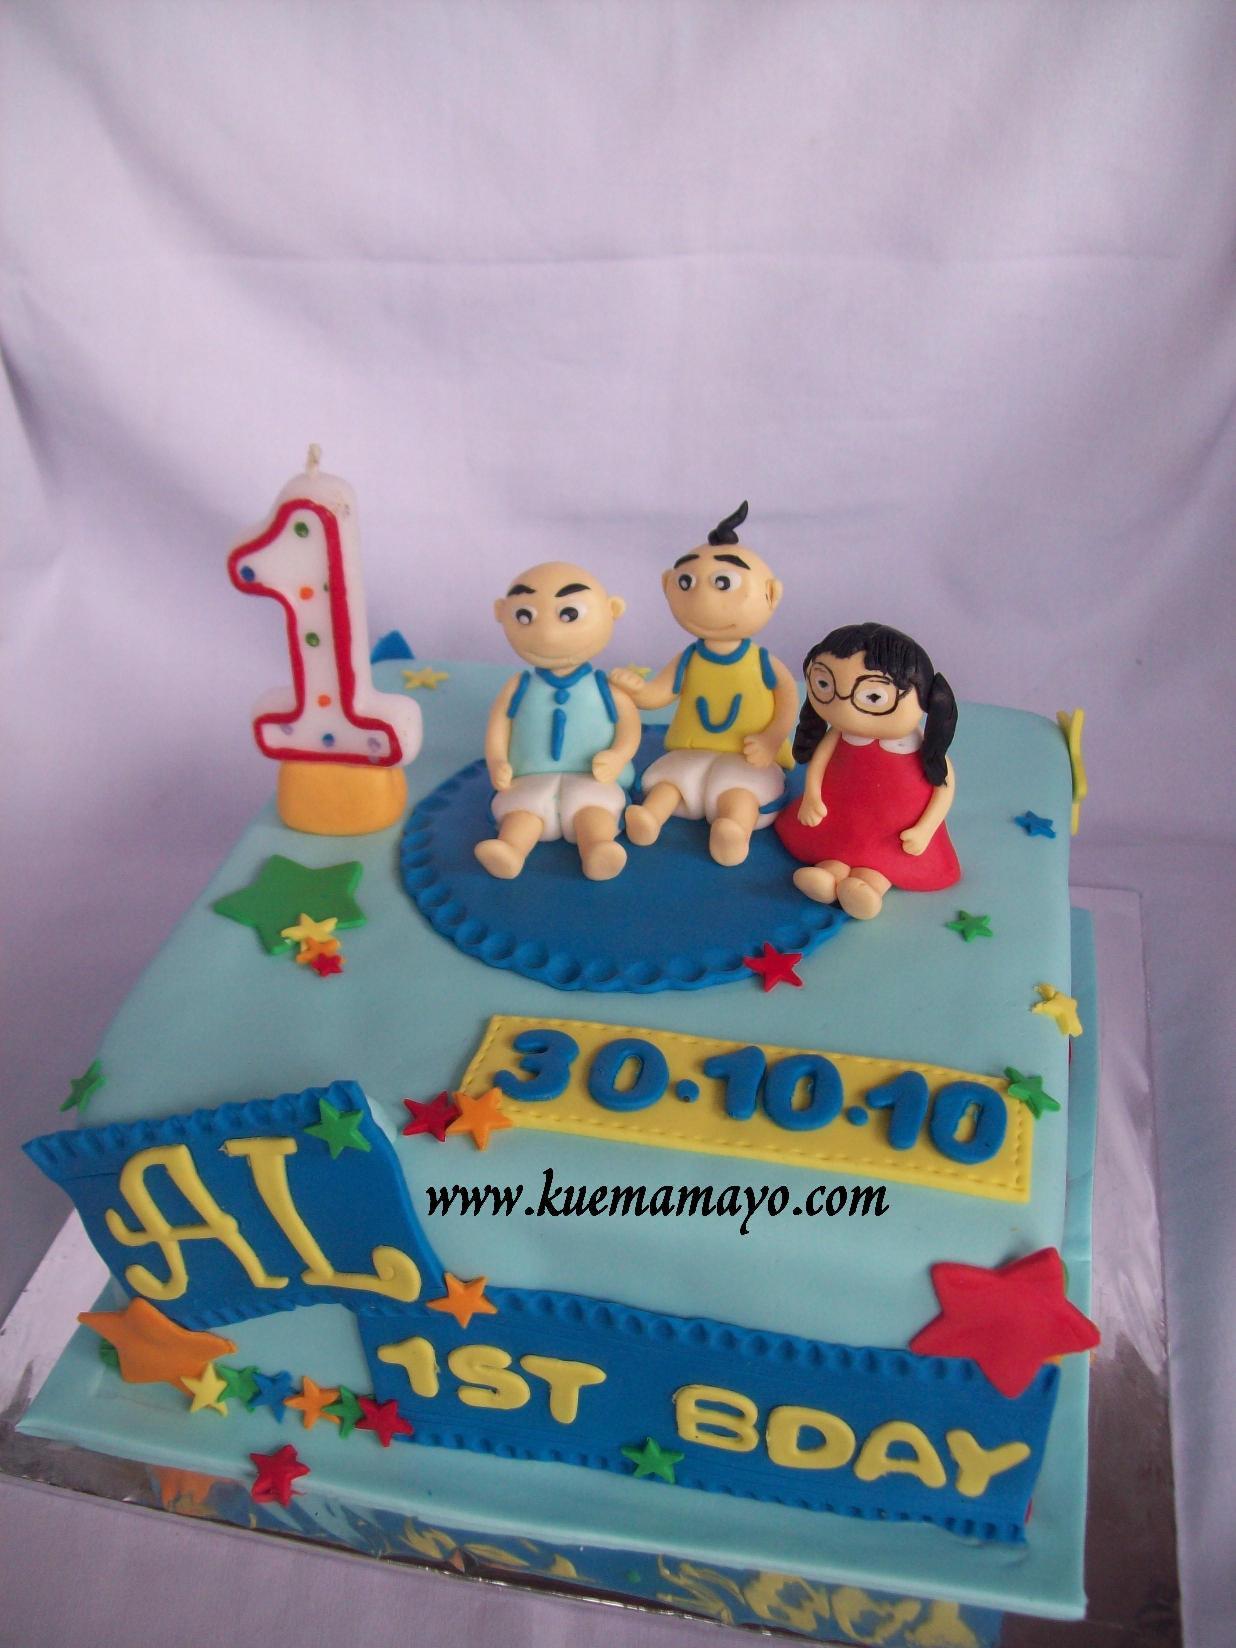 Upinipin cake Abercio Mamayo